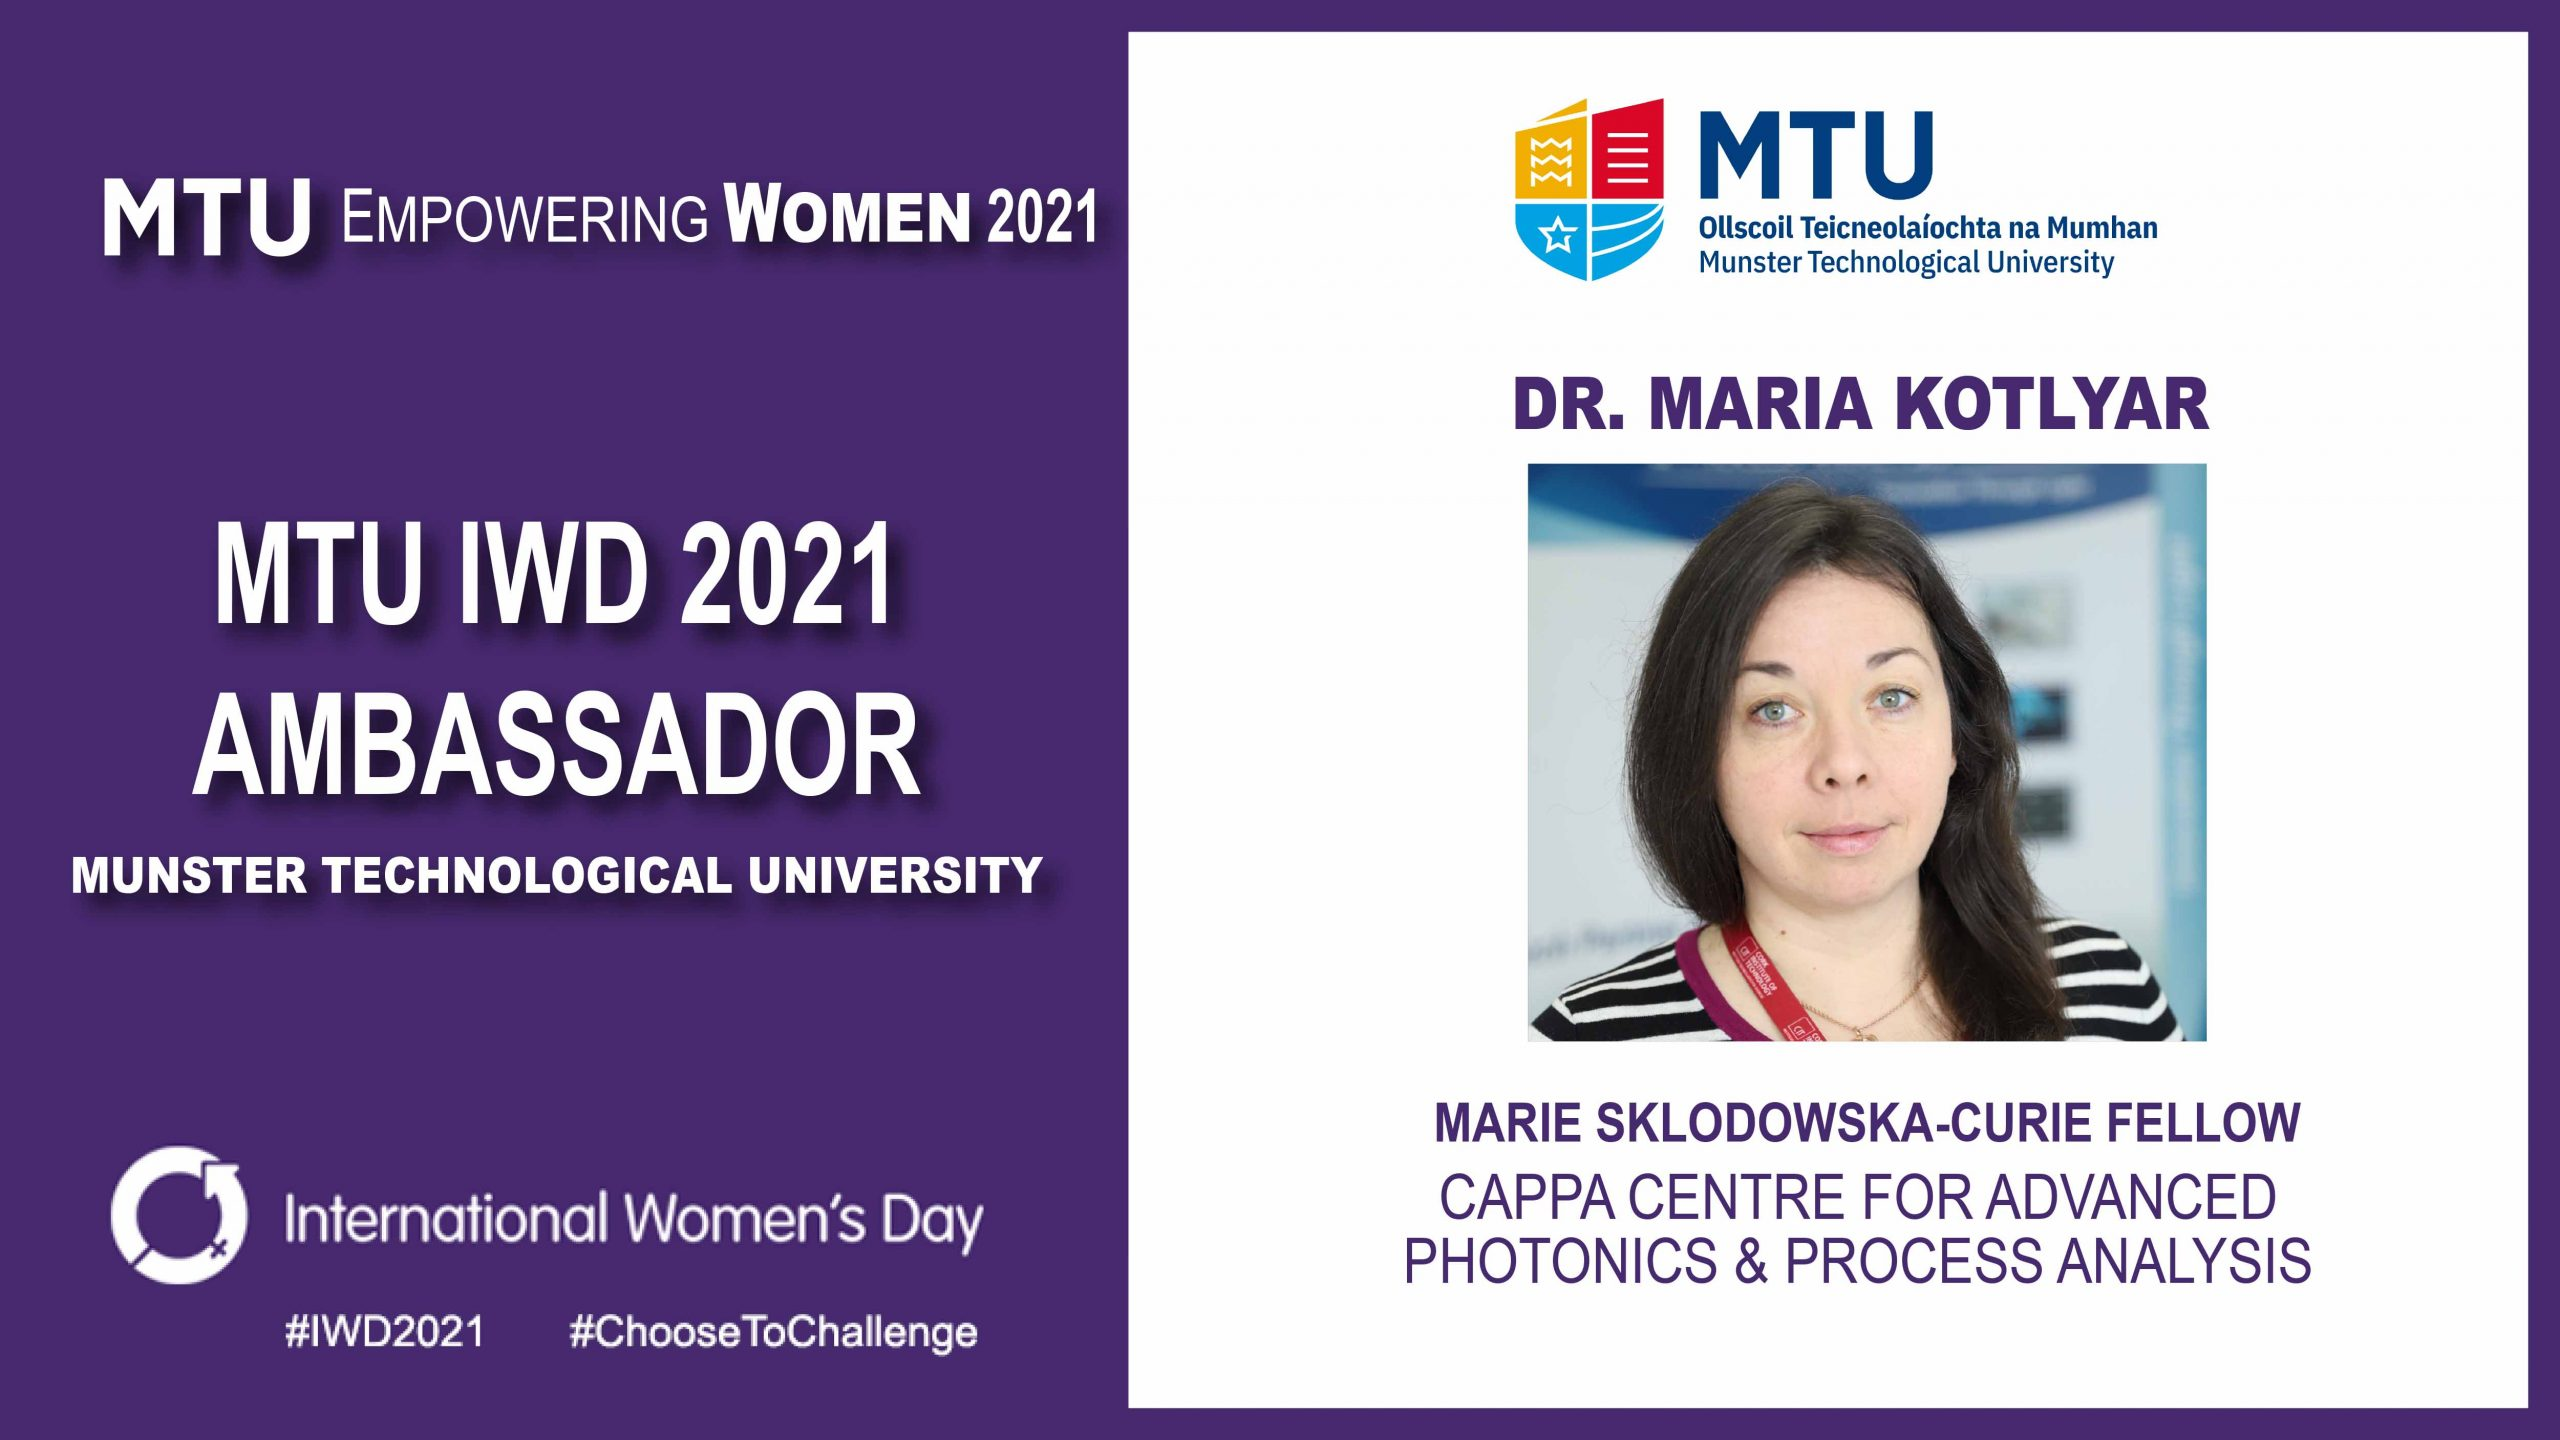 International Women's Day 2021 - CAPPA